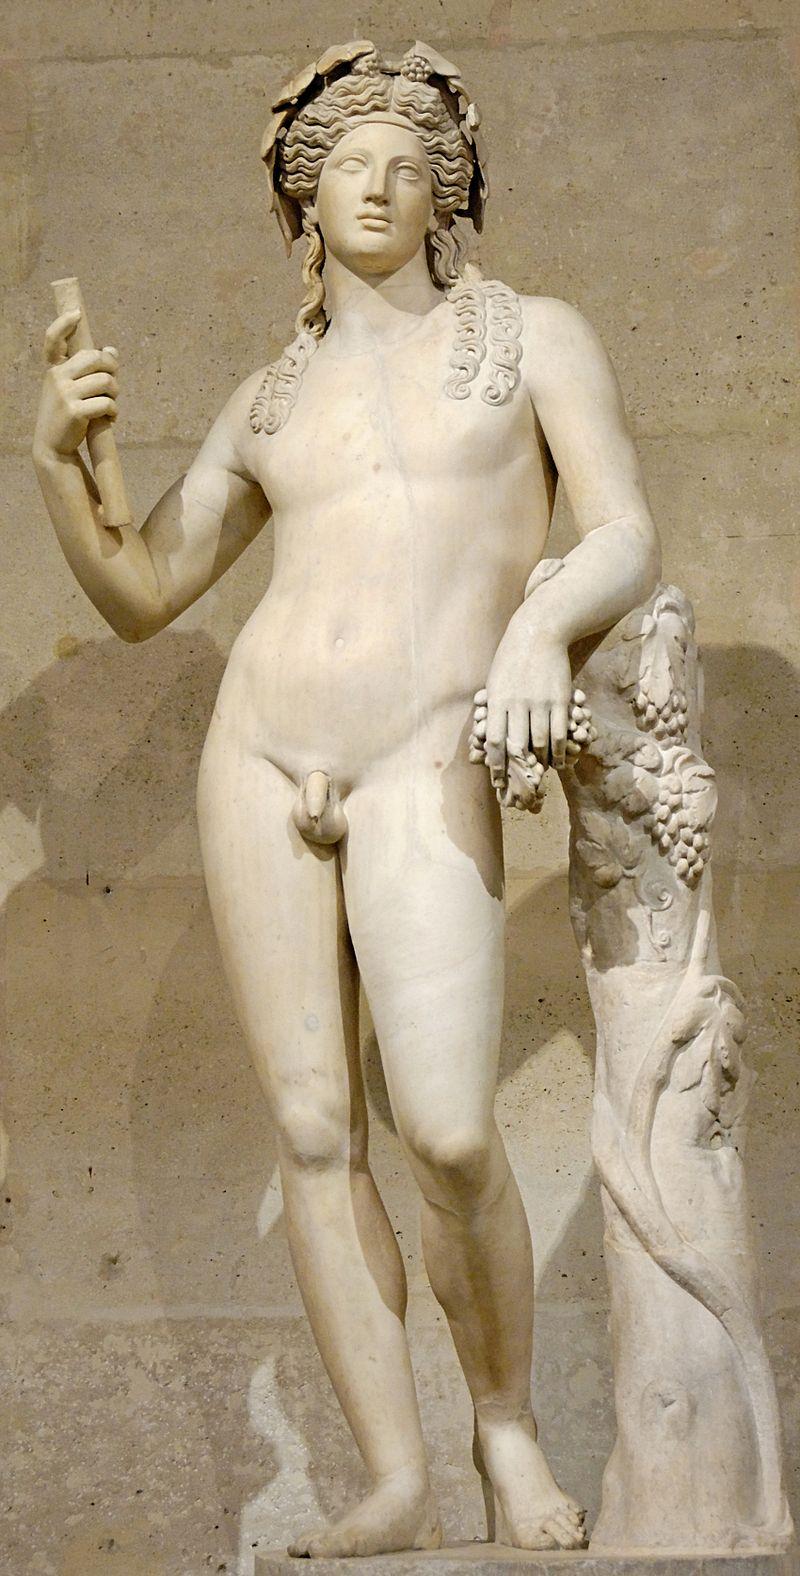 800px-Dionysos_Louvre_Ma87_n2